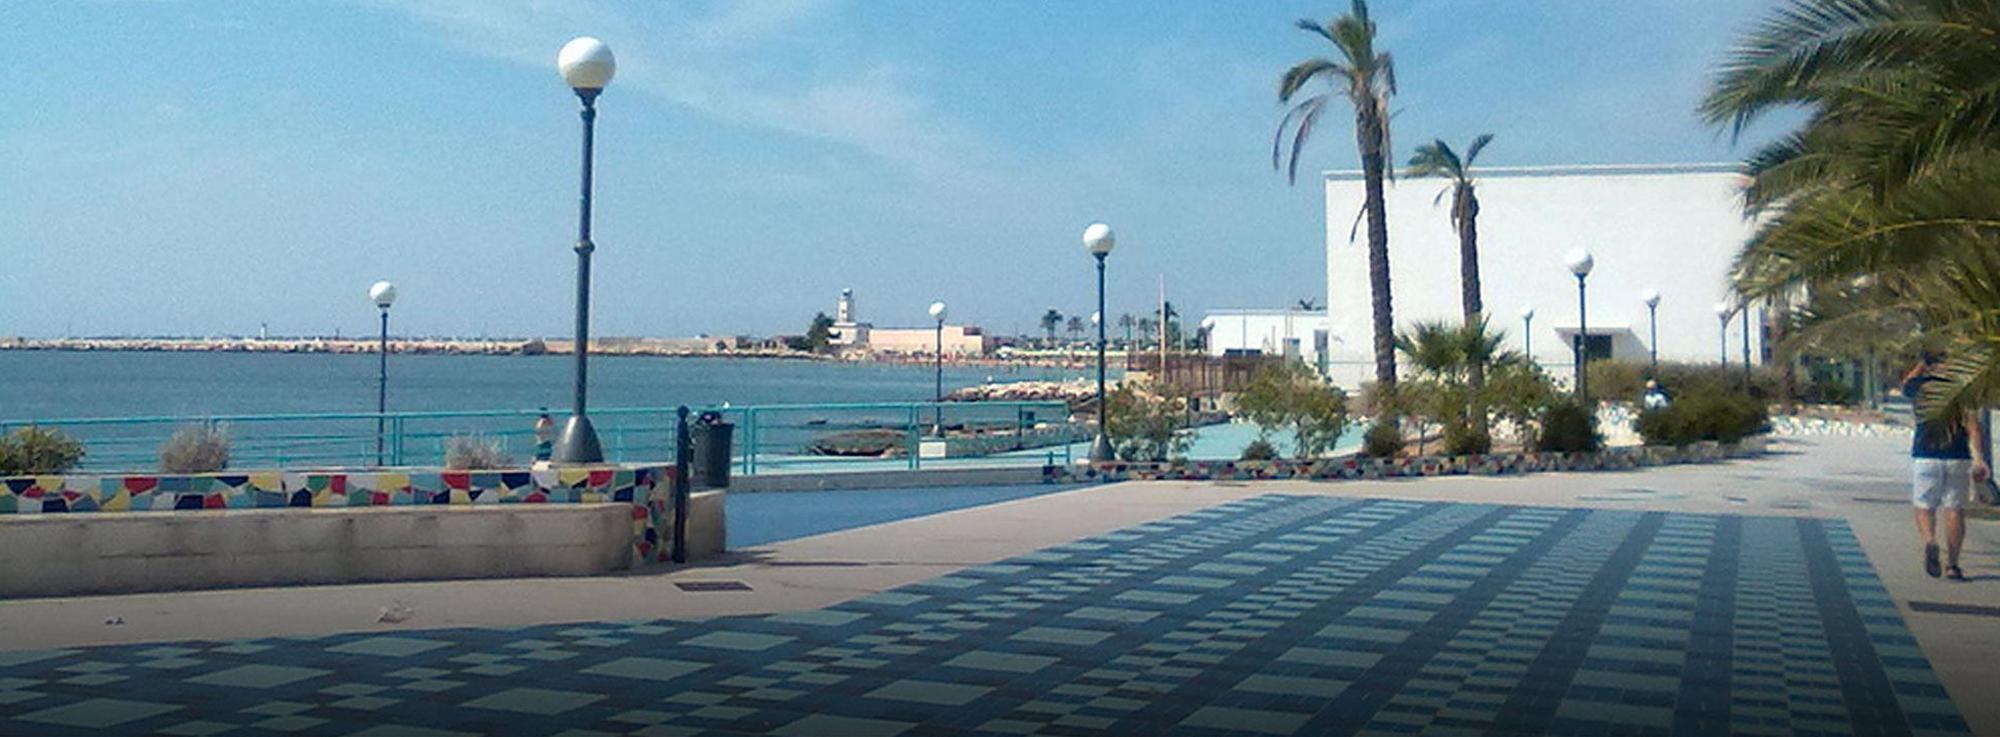 Manfredonia: Settimana A.M.I.C.A.